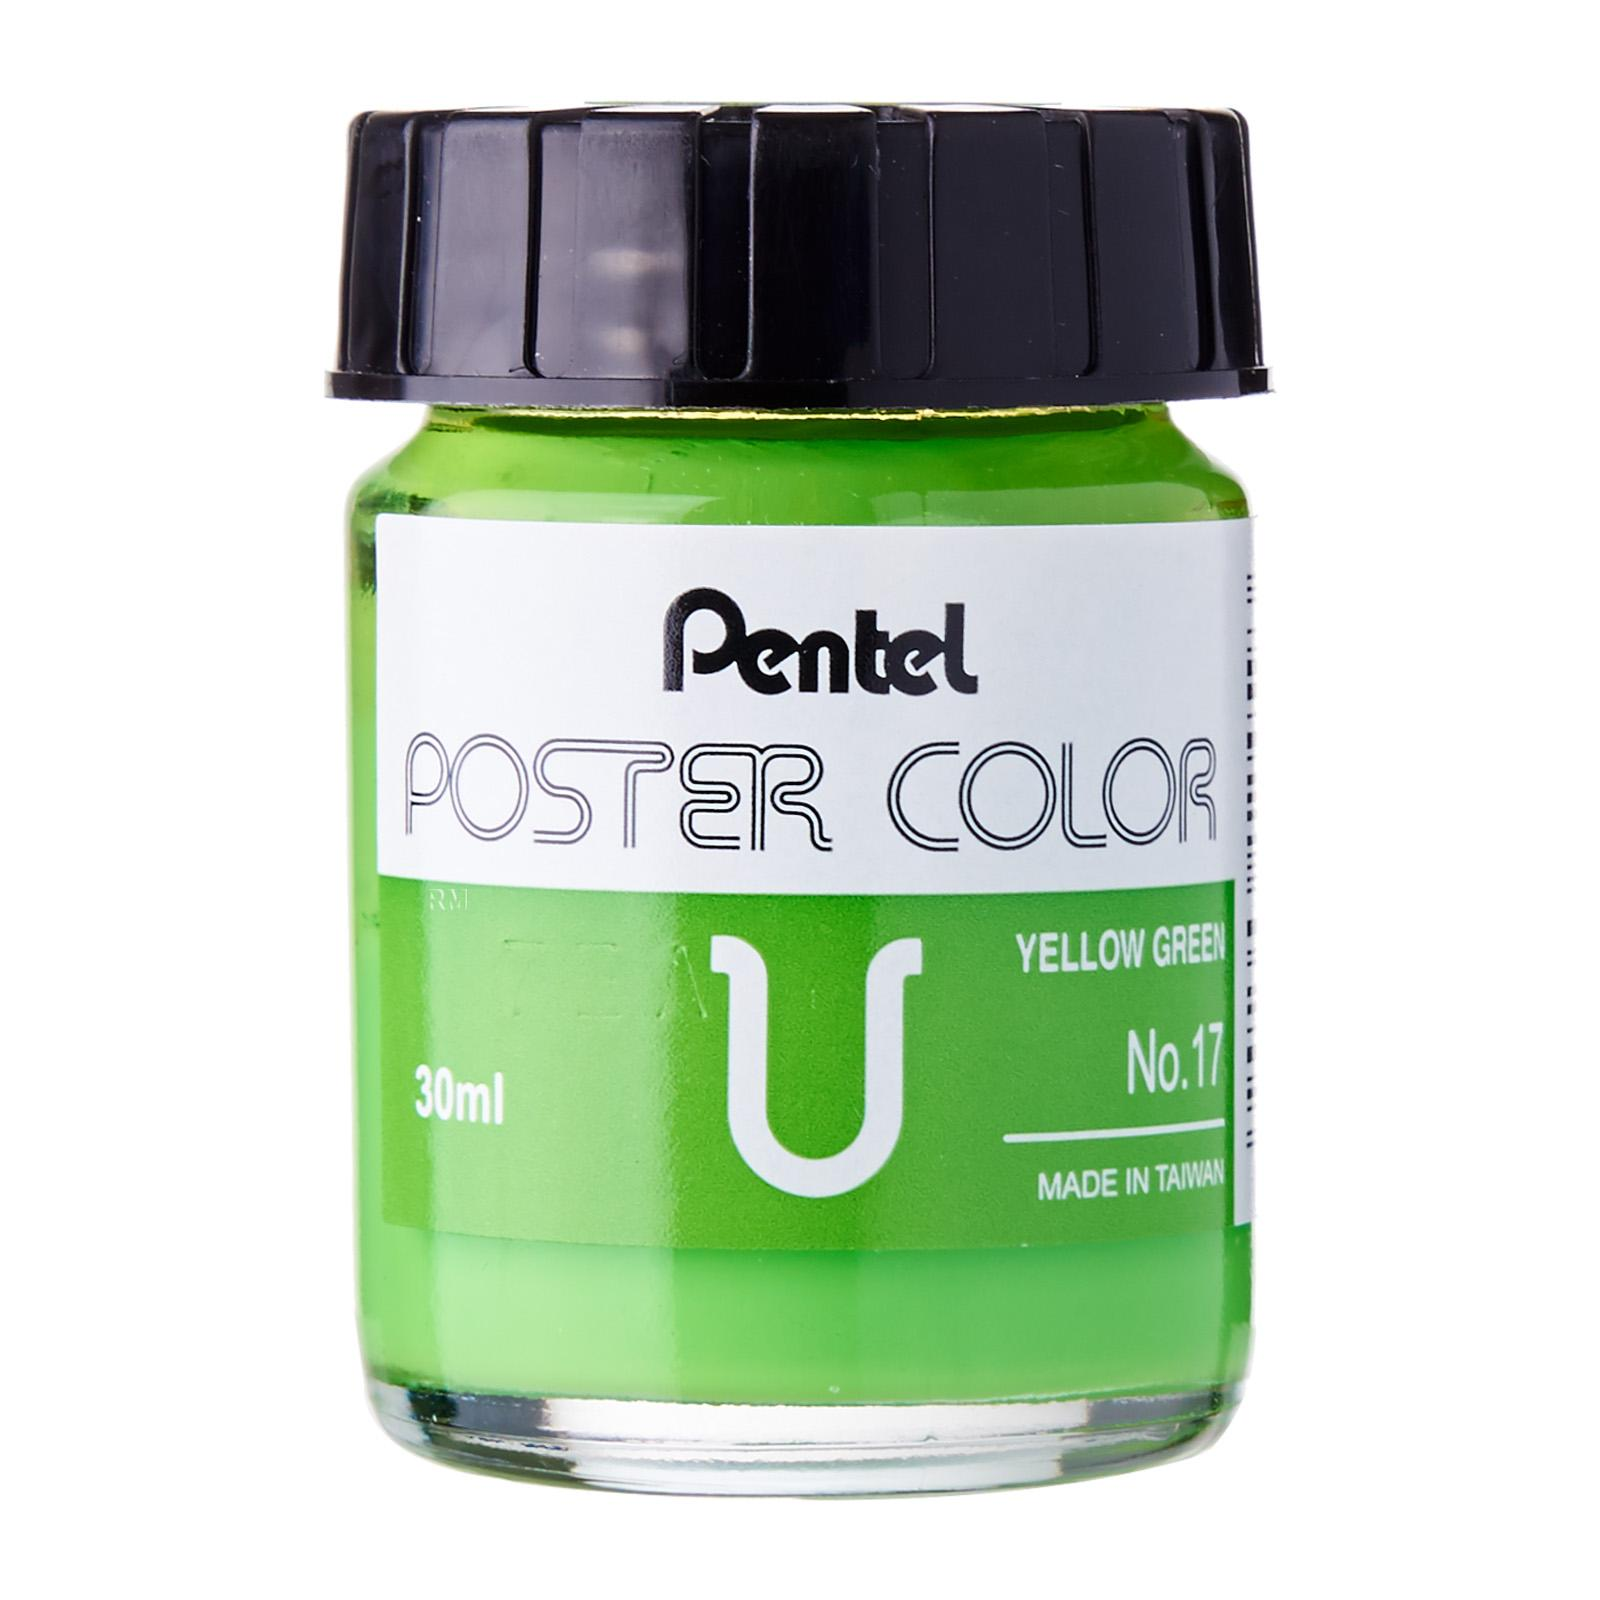 Pentel Poster Color U Yellow Green 30ml (No.17)